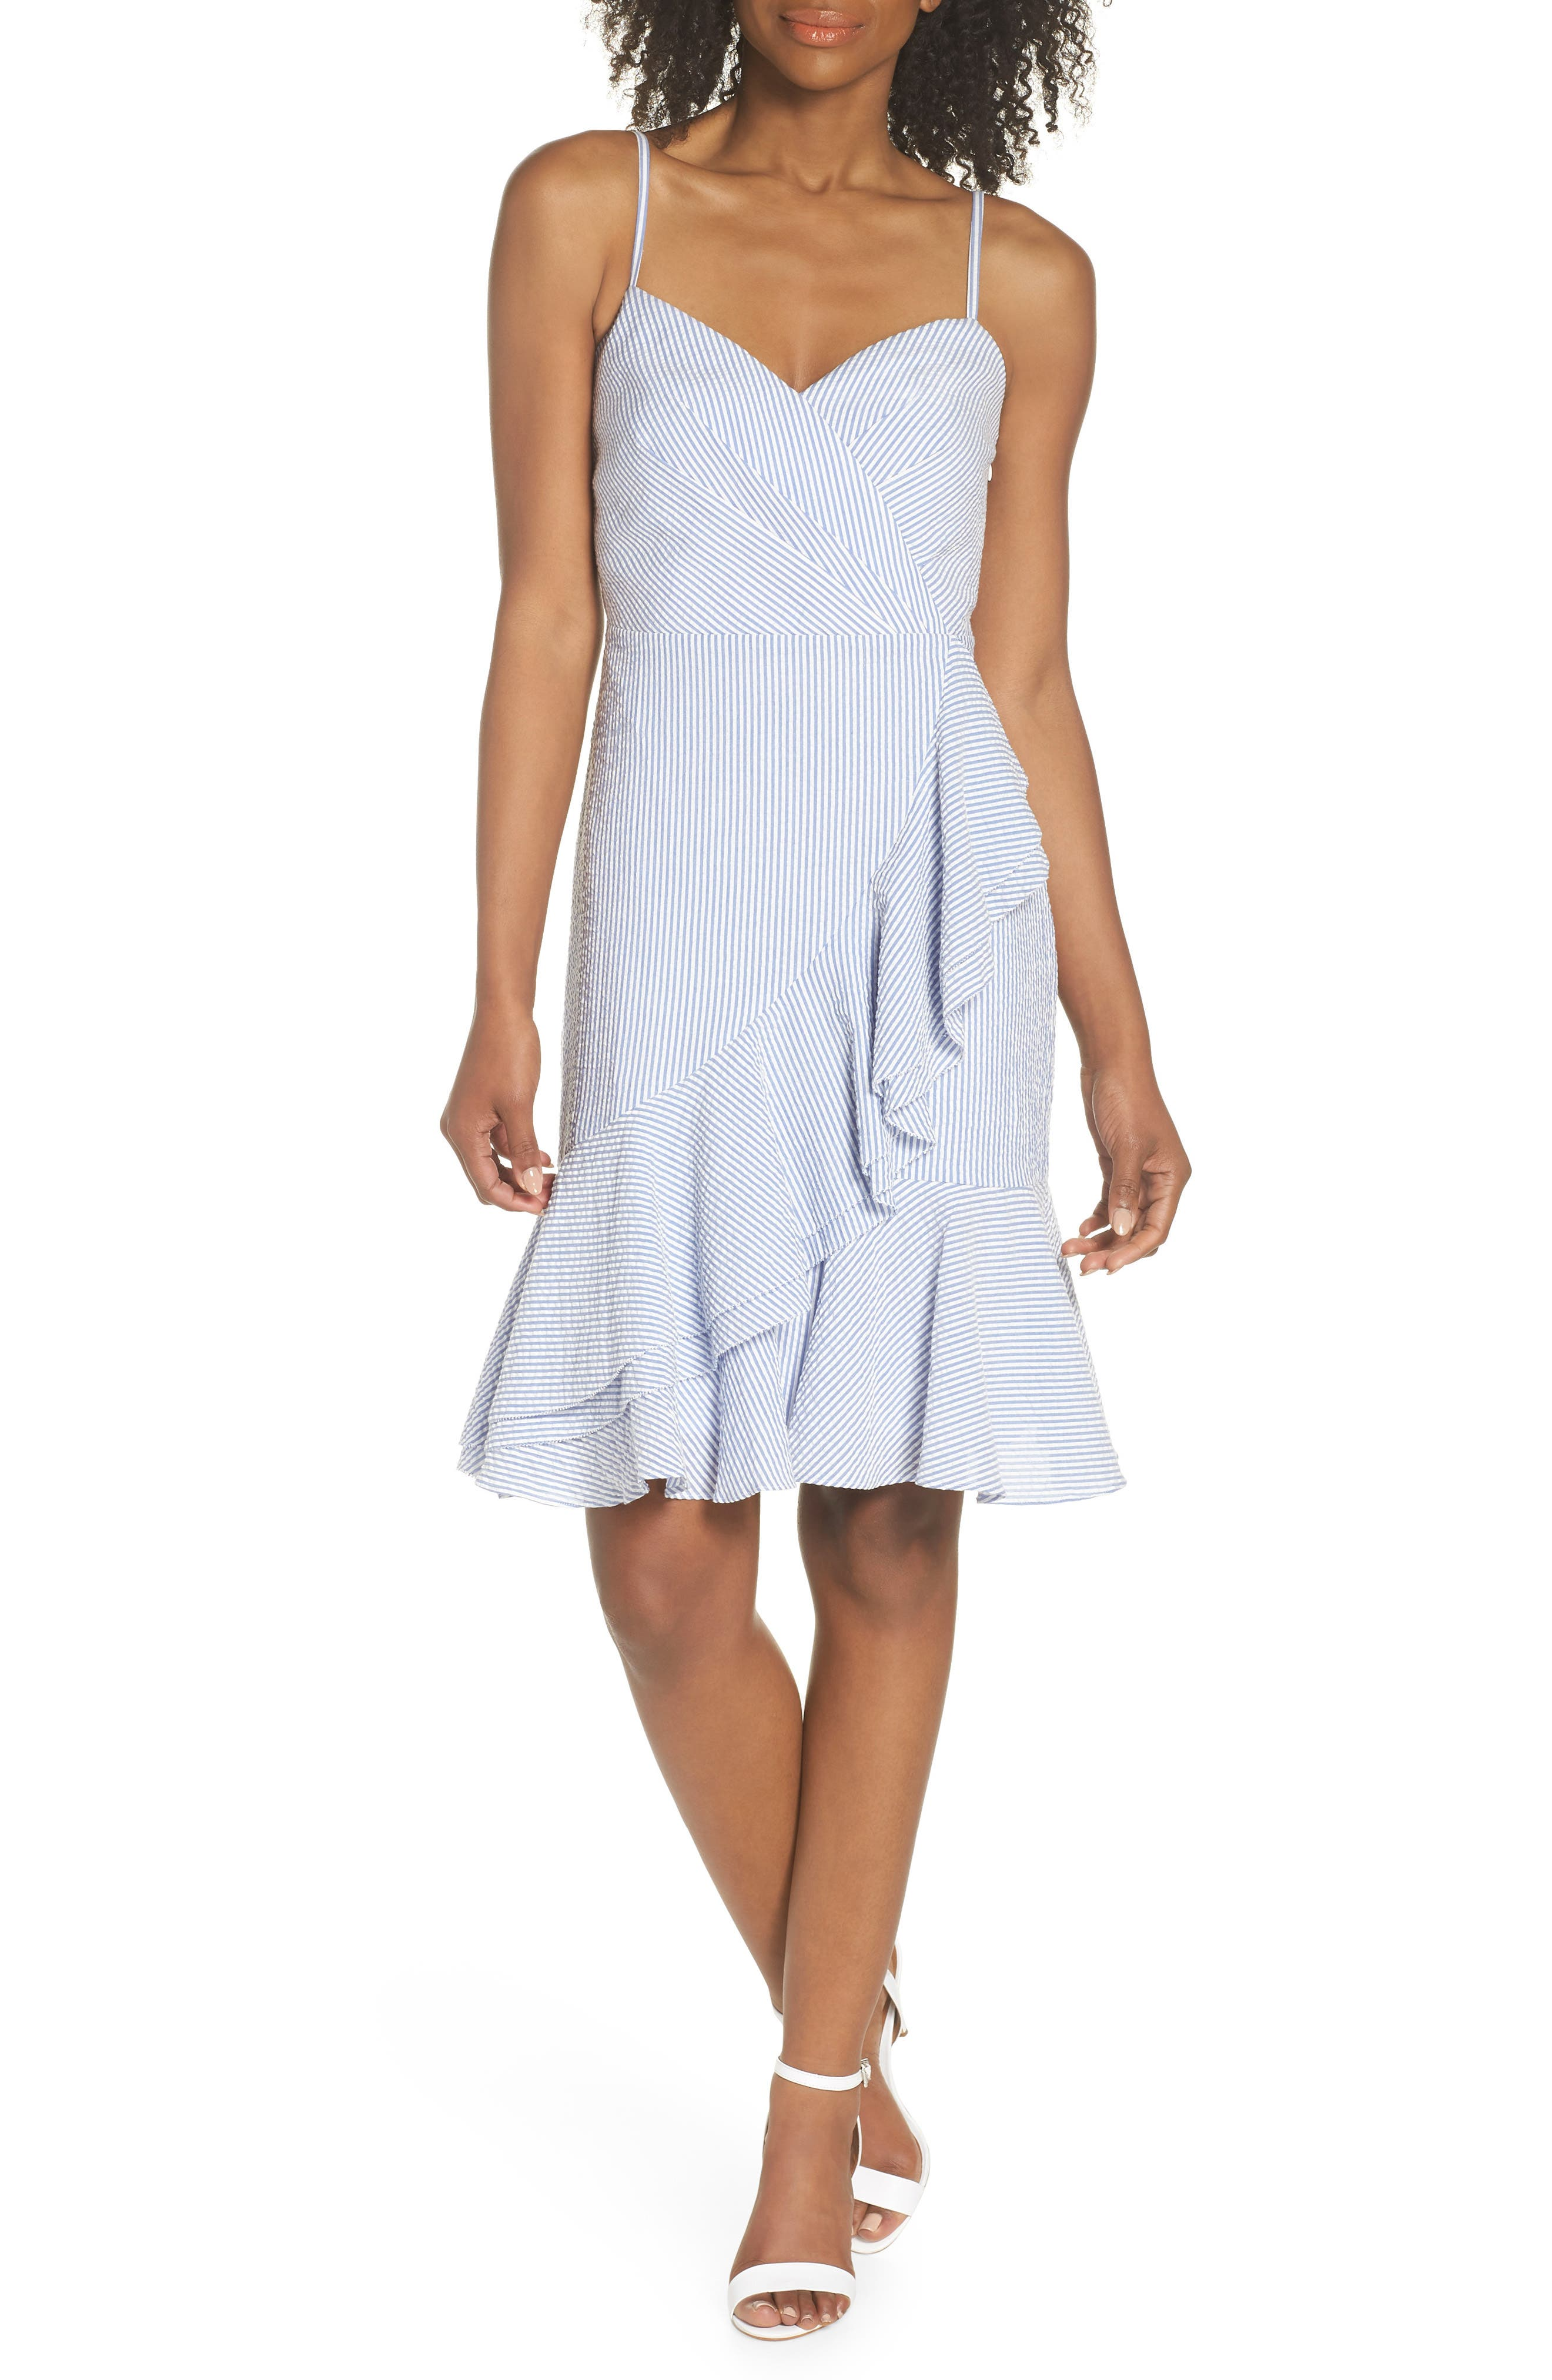 J.Crew Spaghetti Strap Ruffle Dress,                             Main thumbnail 1, color,                             Blue White